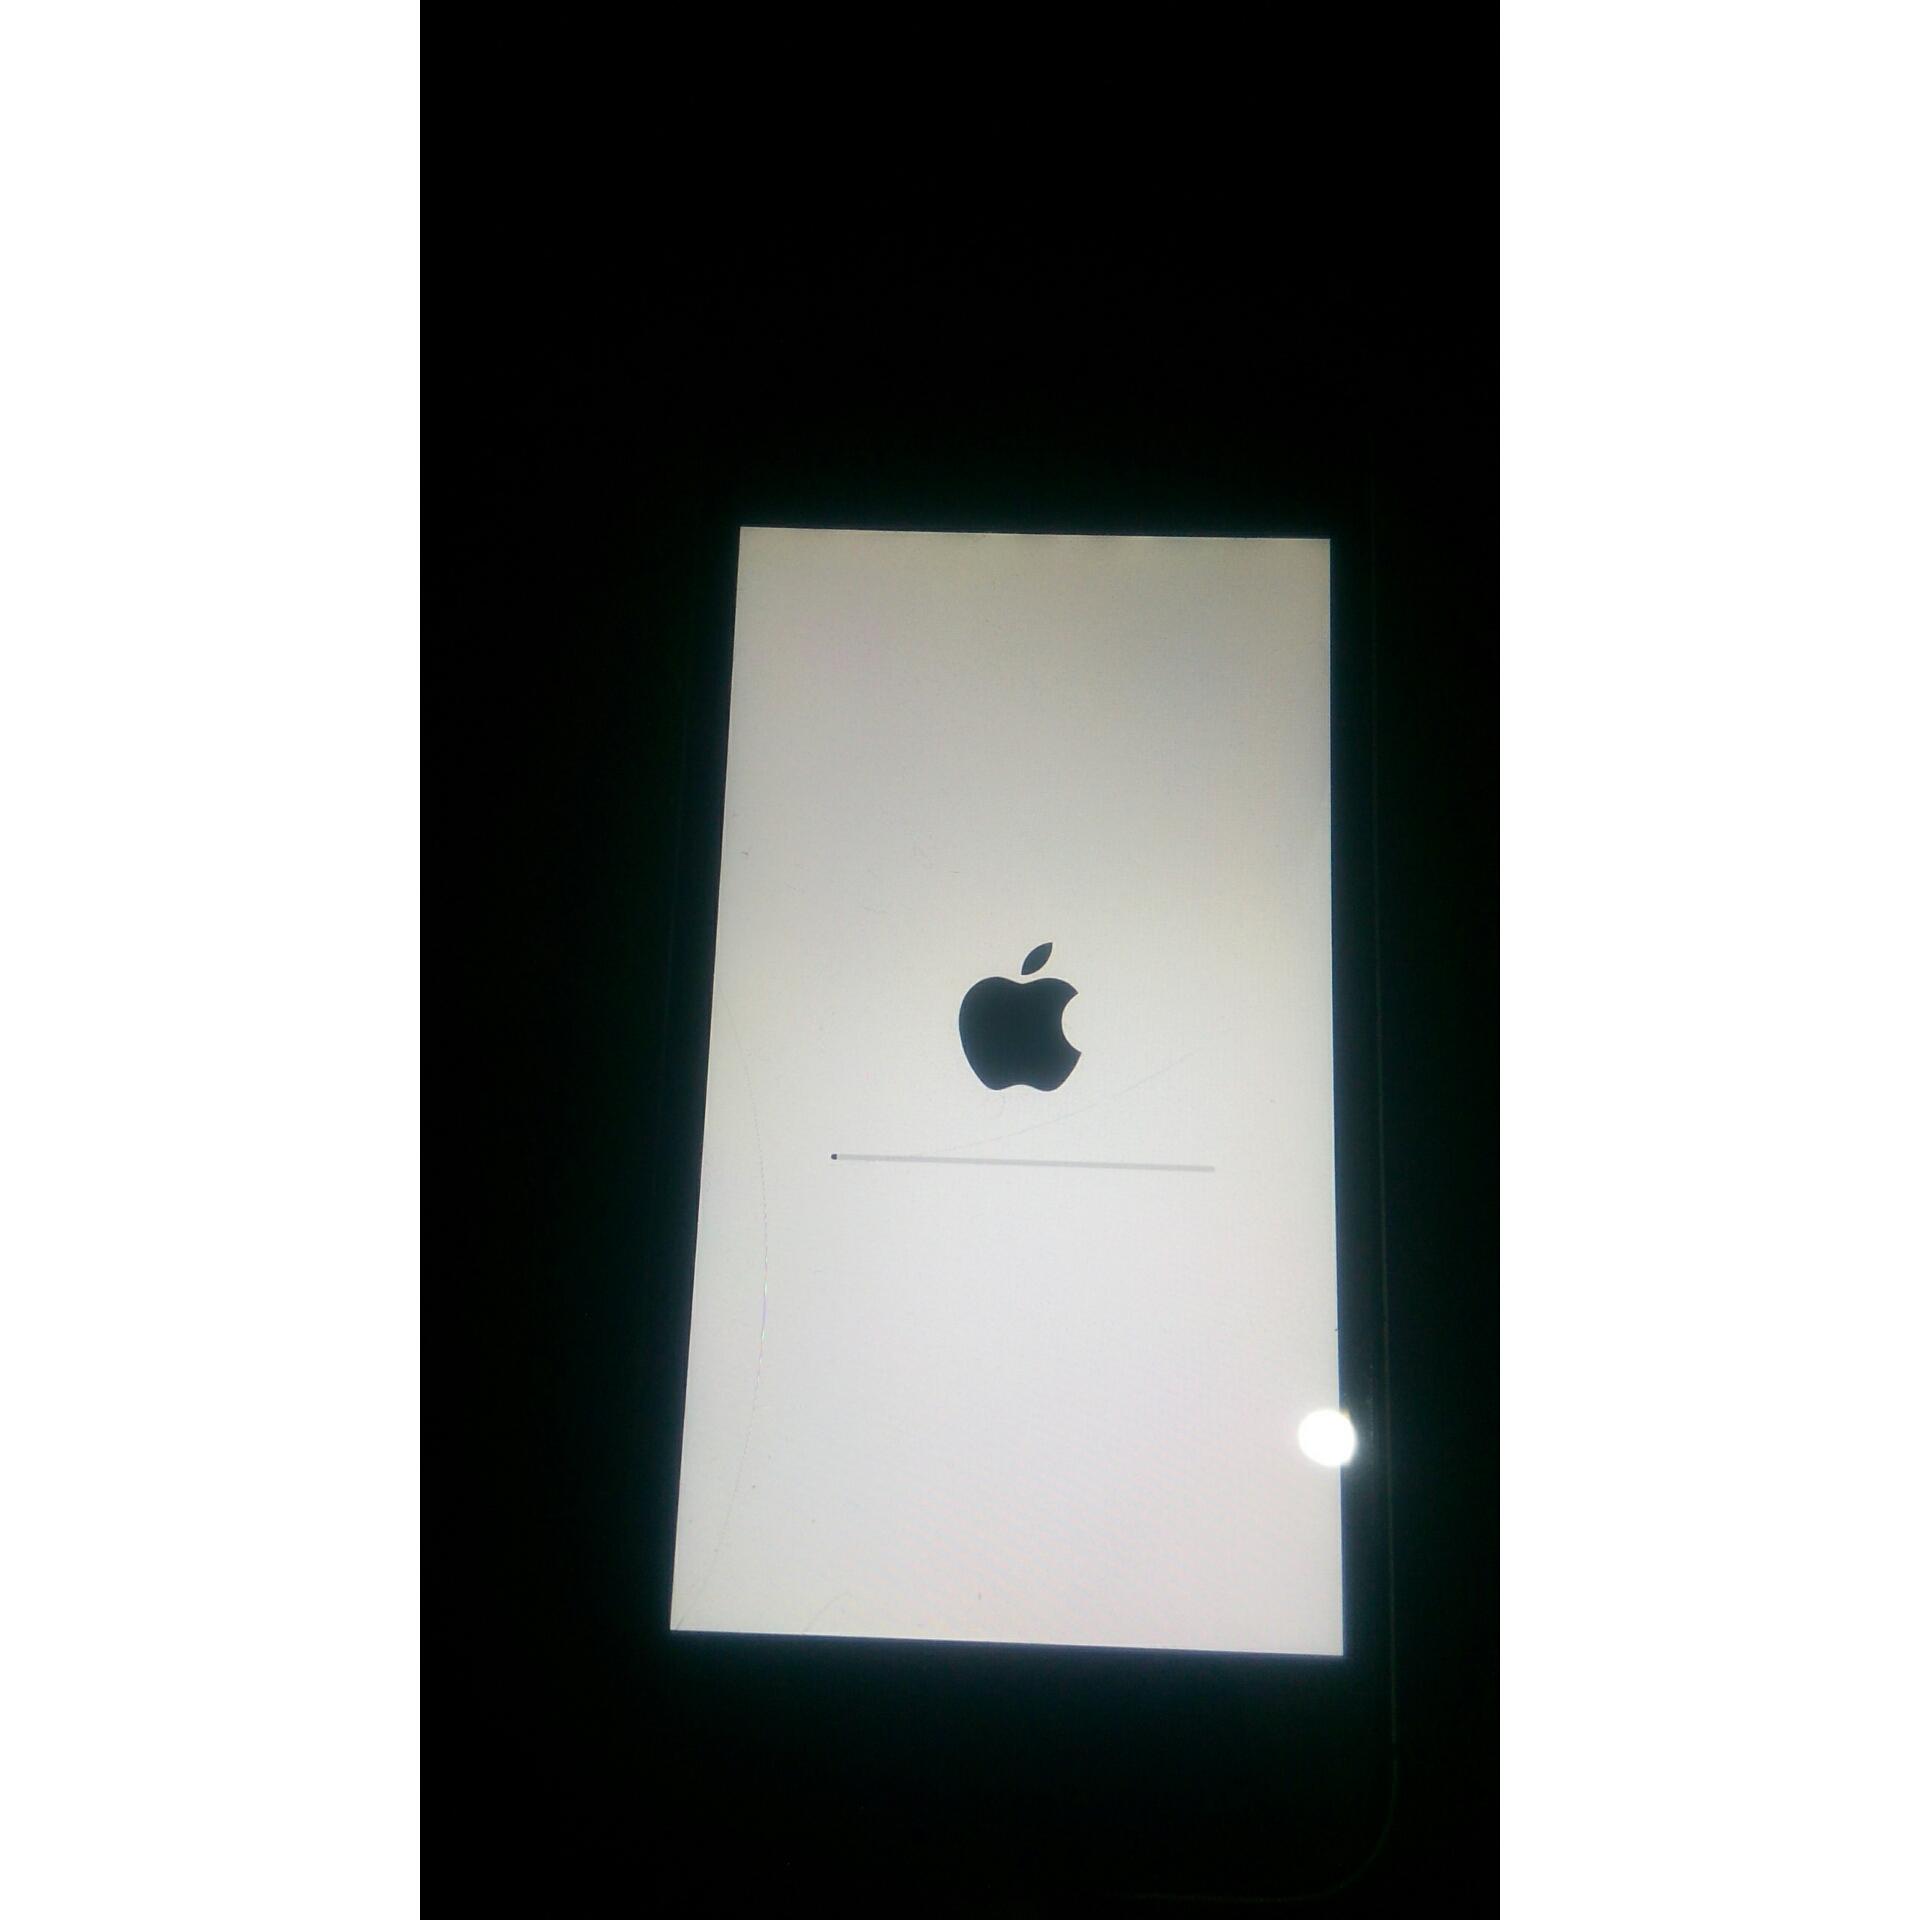 IPhone 5s stuck in recovery (Error 14) - Apple Community